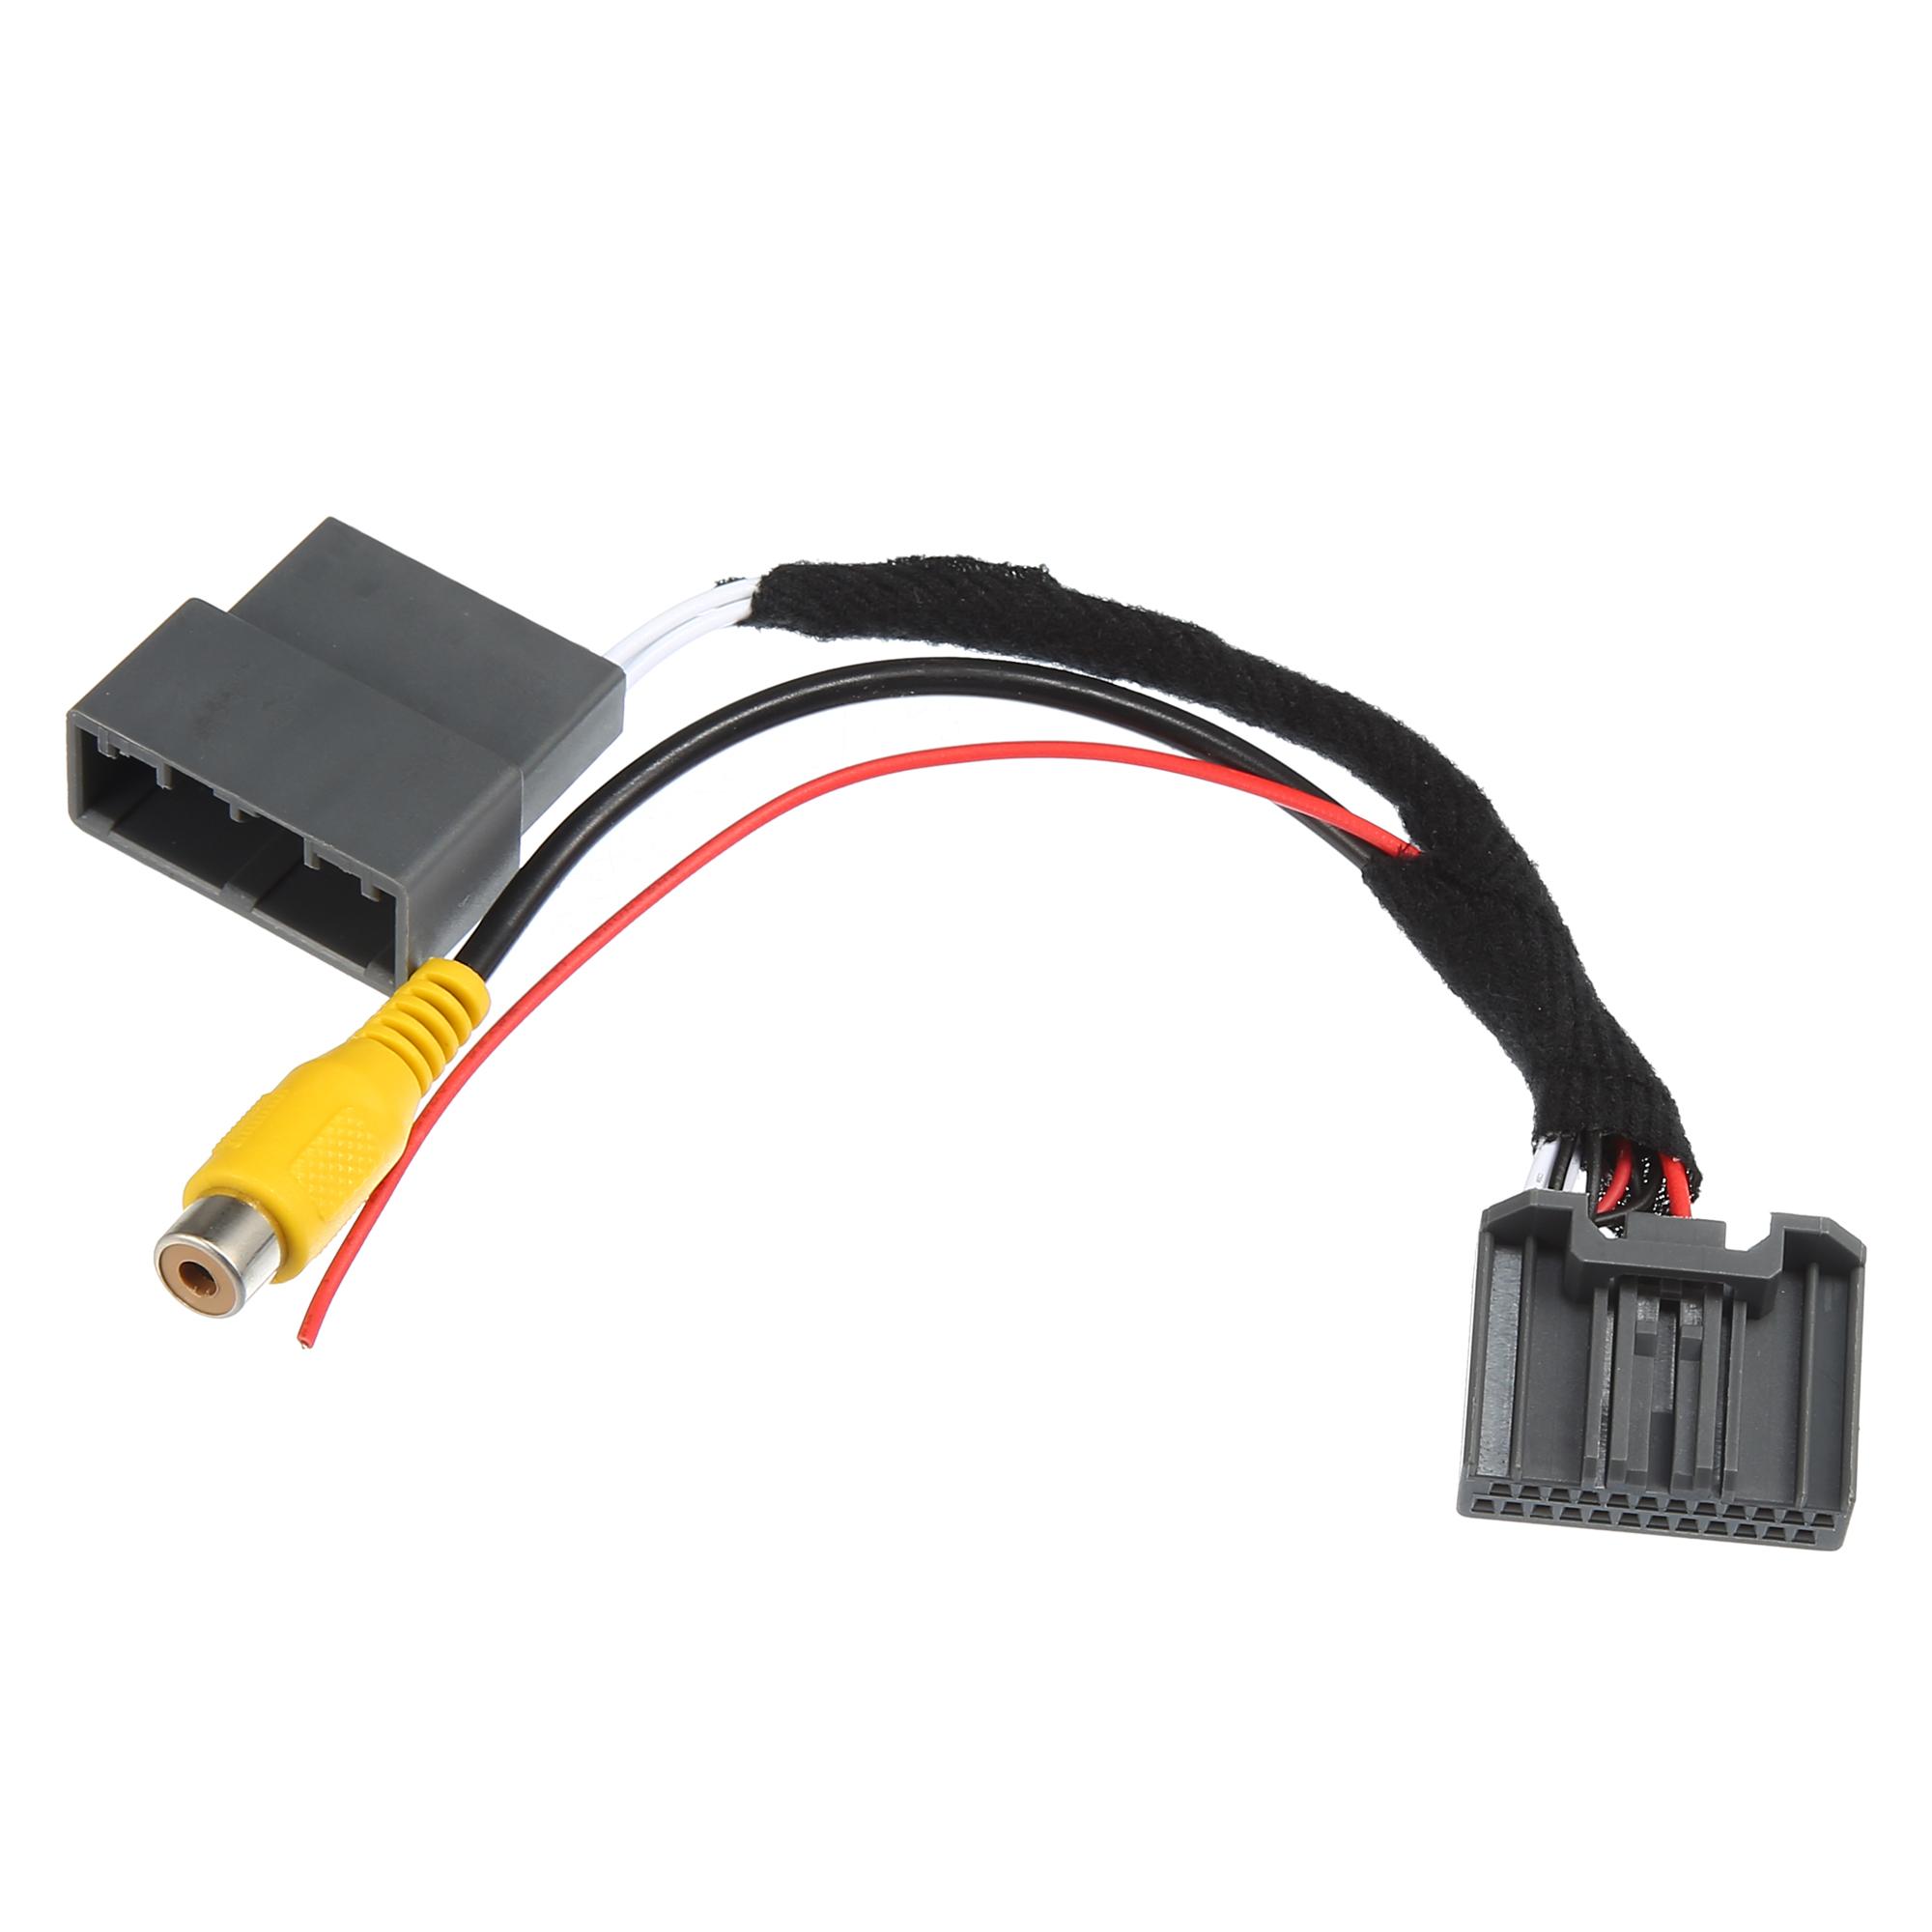 Car Navigation Reverse Rear View Camera Cable Dual Adapter for Honda Accord 2.4